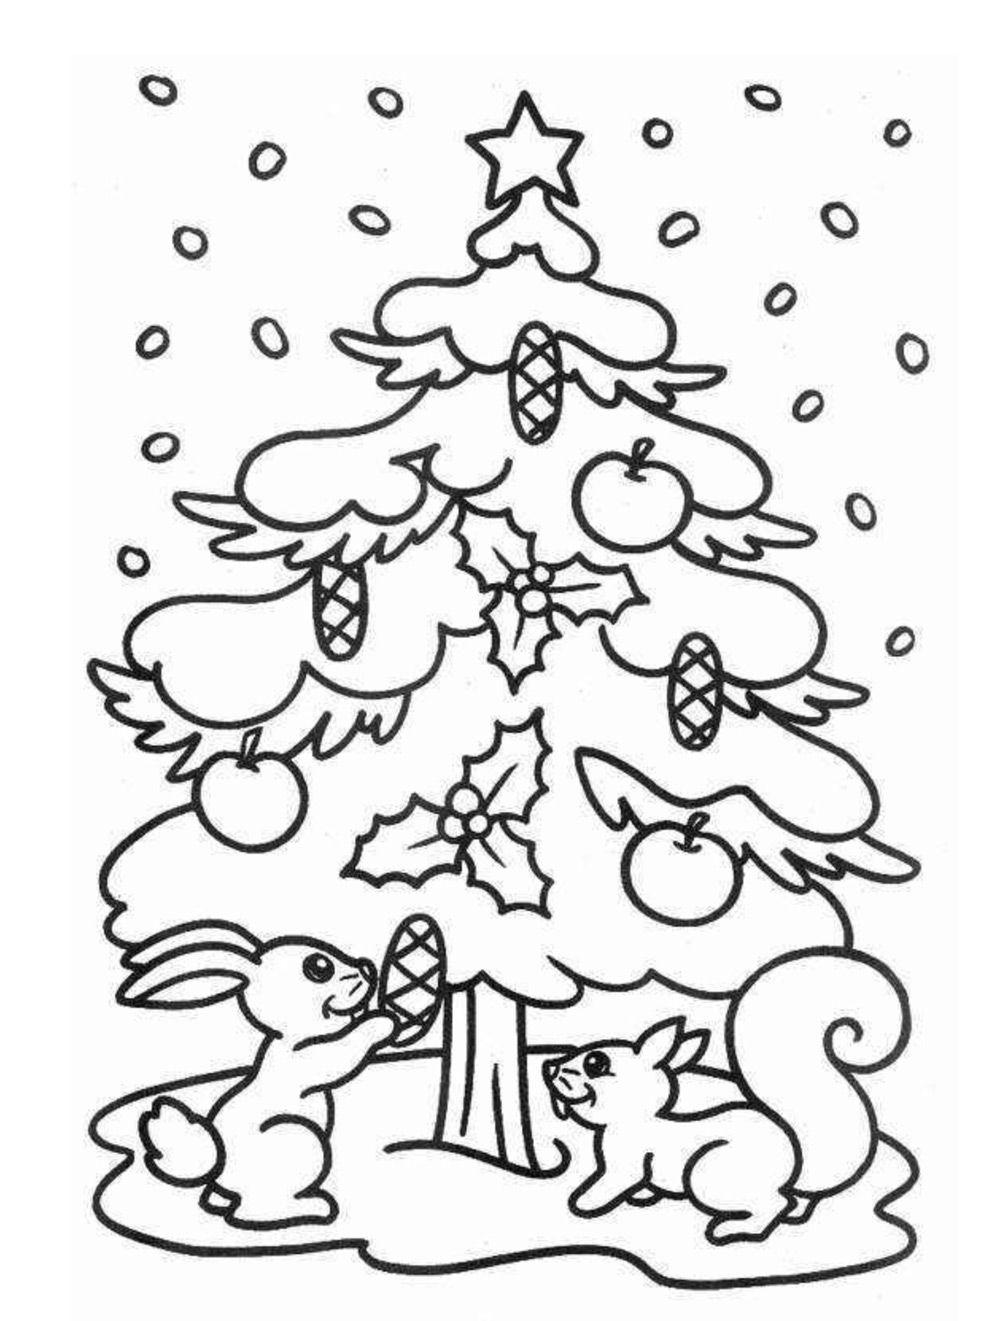 Imprimir Dibujos De Navidad. Dibujos Navidad Para Imprimir